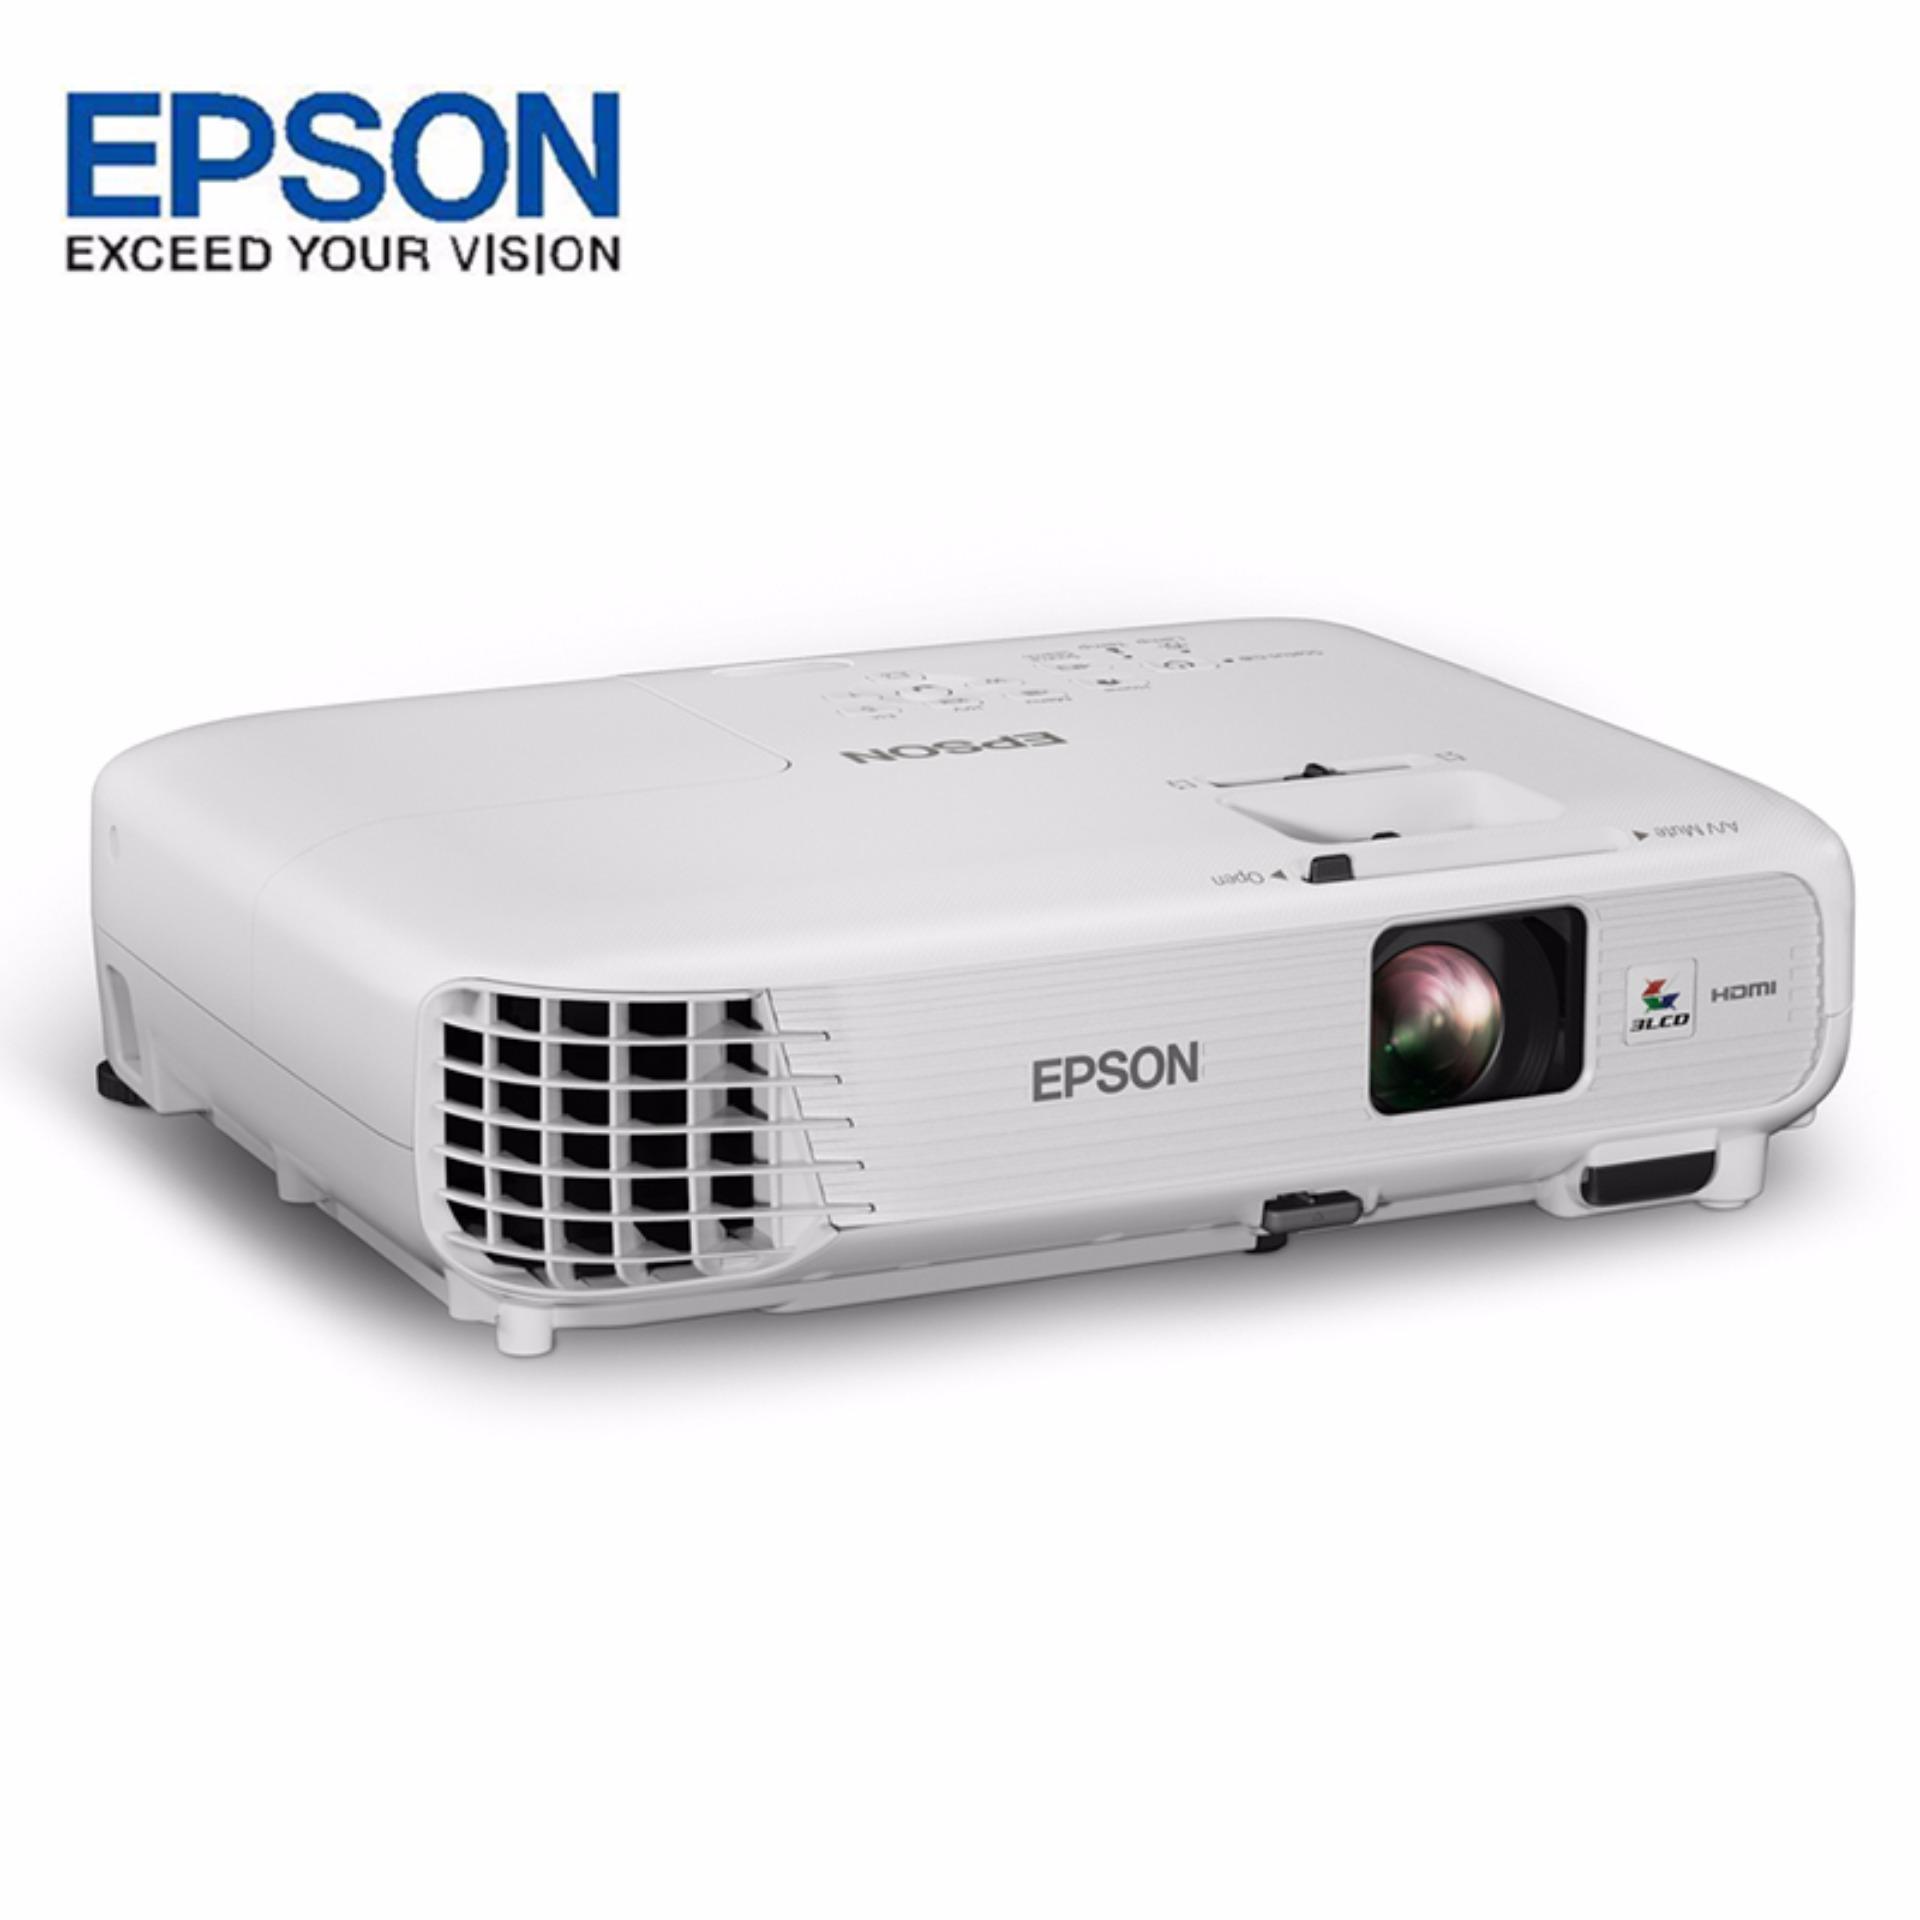 Epson Proyektor EB-S300 - Putih ...